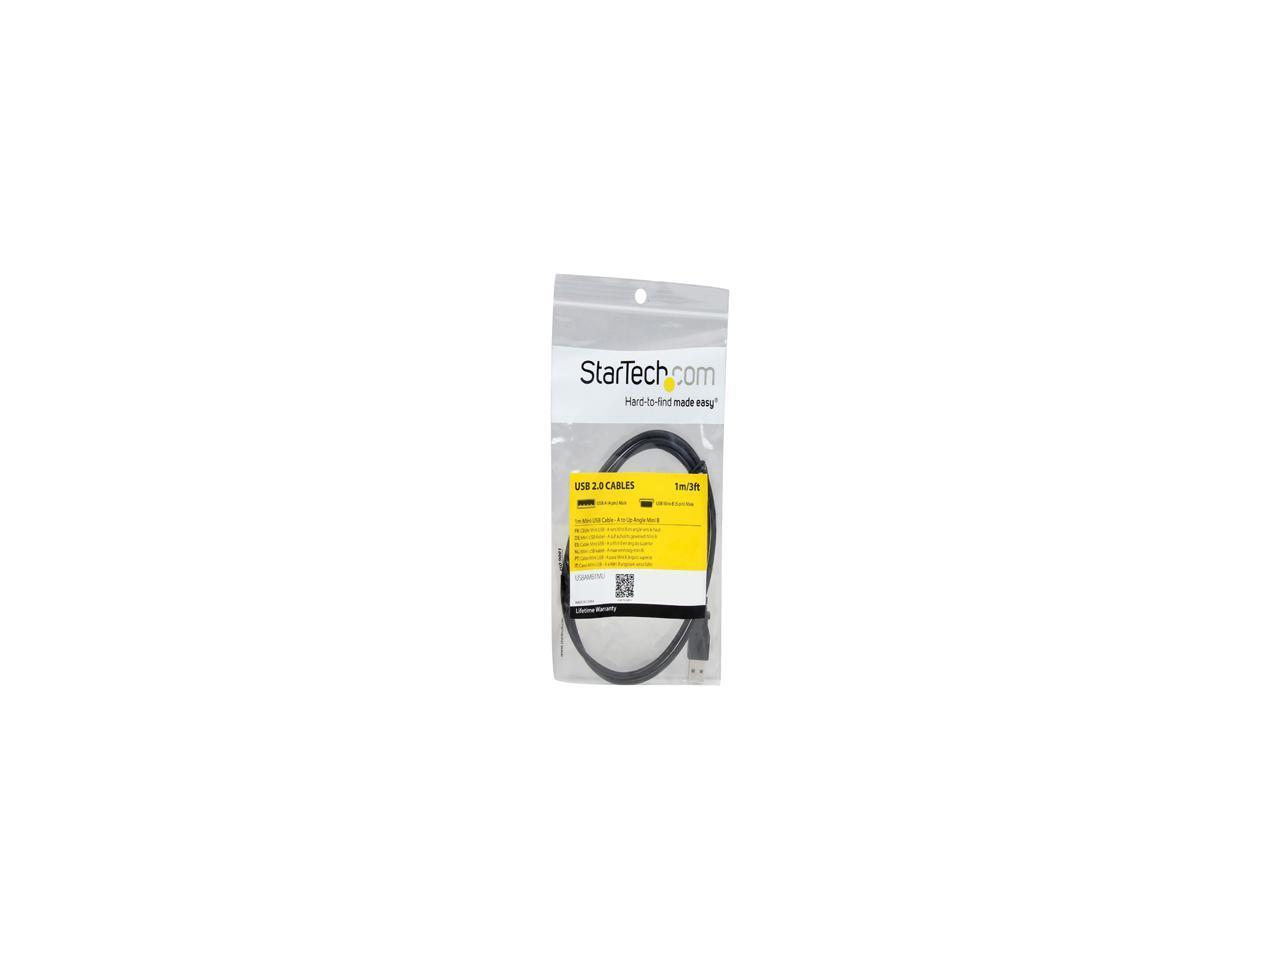 StarTech.com USBAMB1MU 1m Mini USB Cable Cord-A to Up Angle Mini B Black